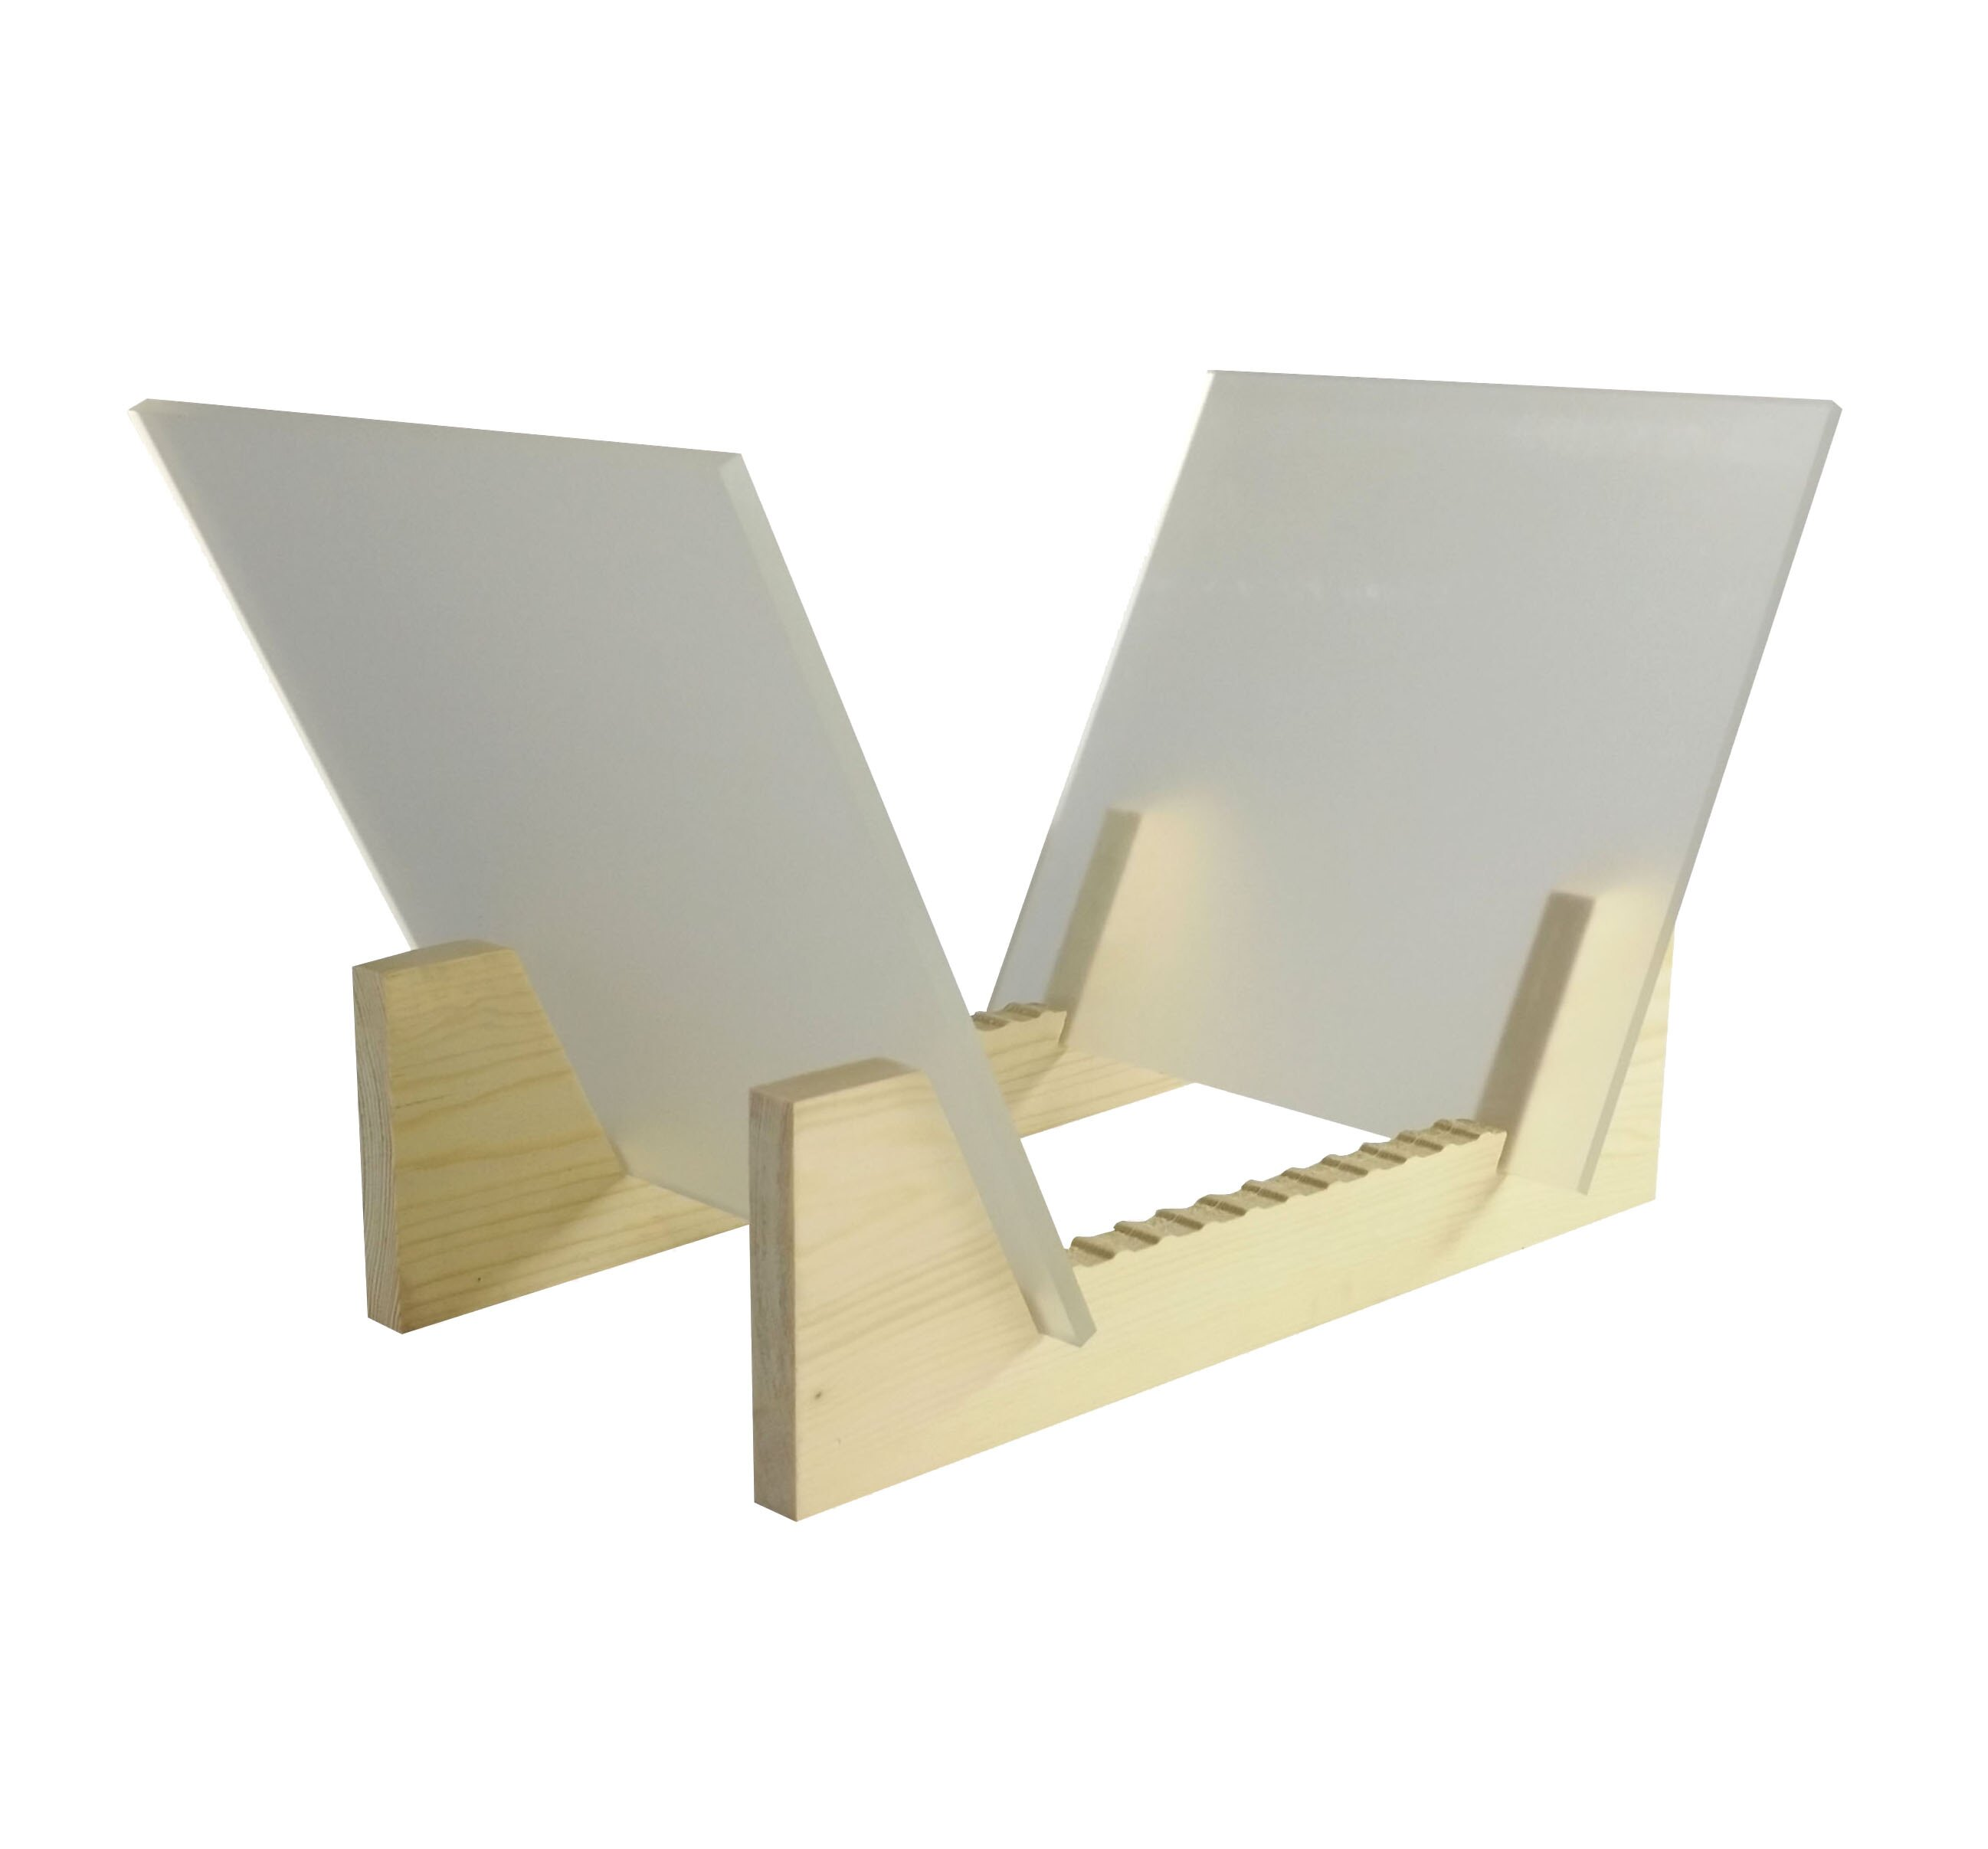 389b373e999b Fixture Displays Vinyl Record Storage 25-Album Display Holder LP Organizer  Tabletop LP Stand Pine